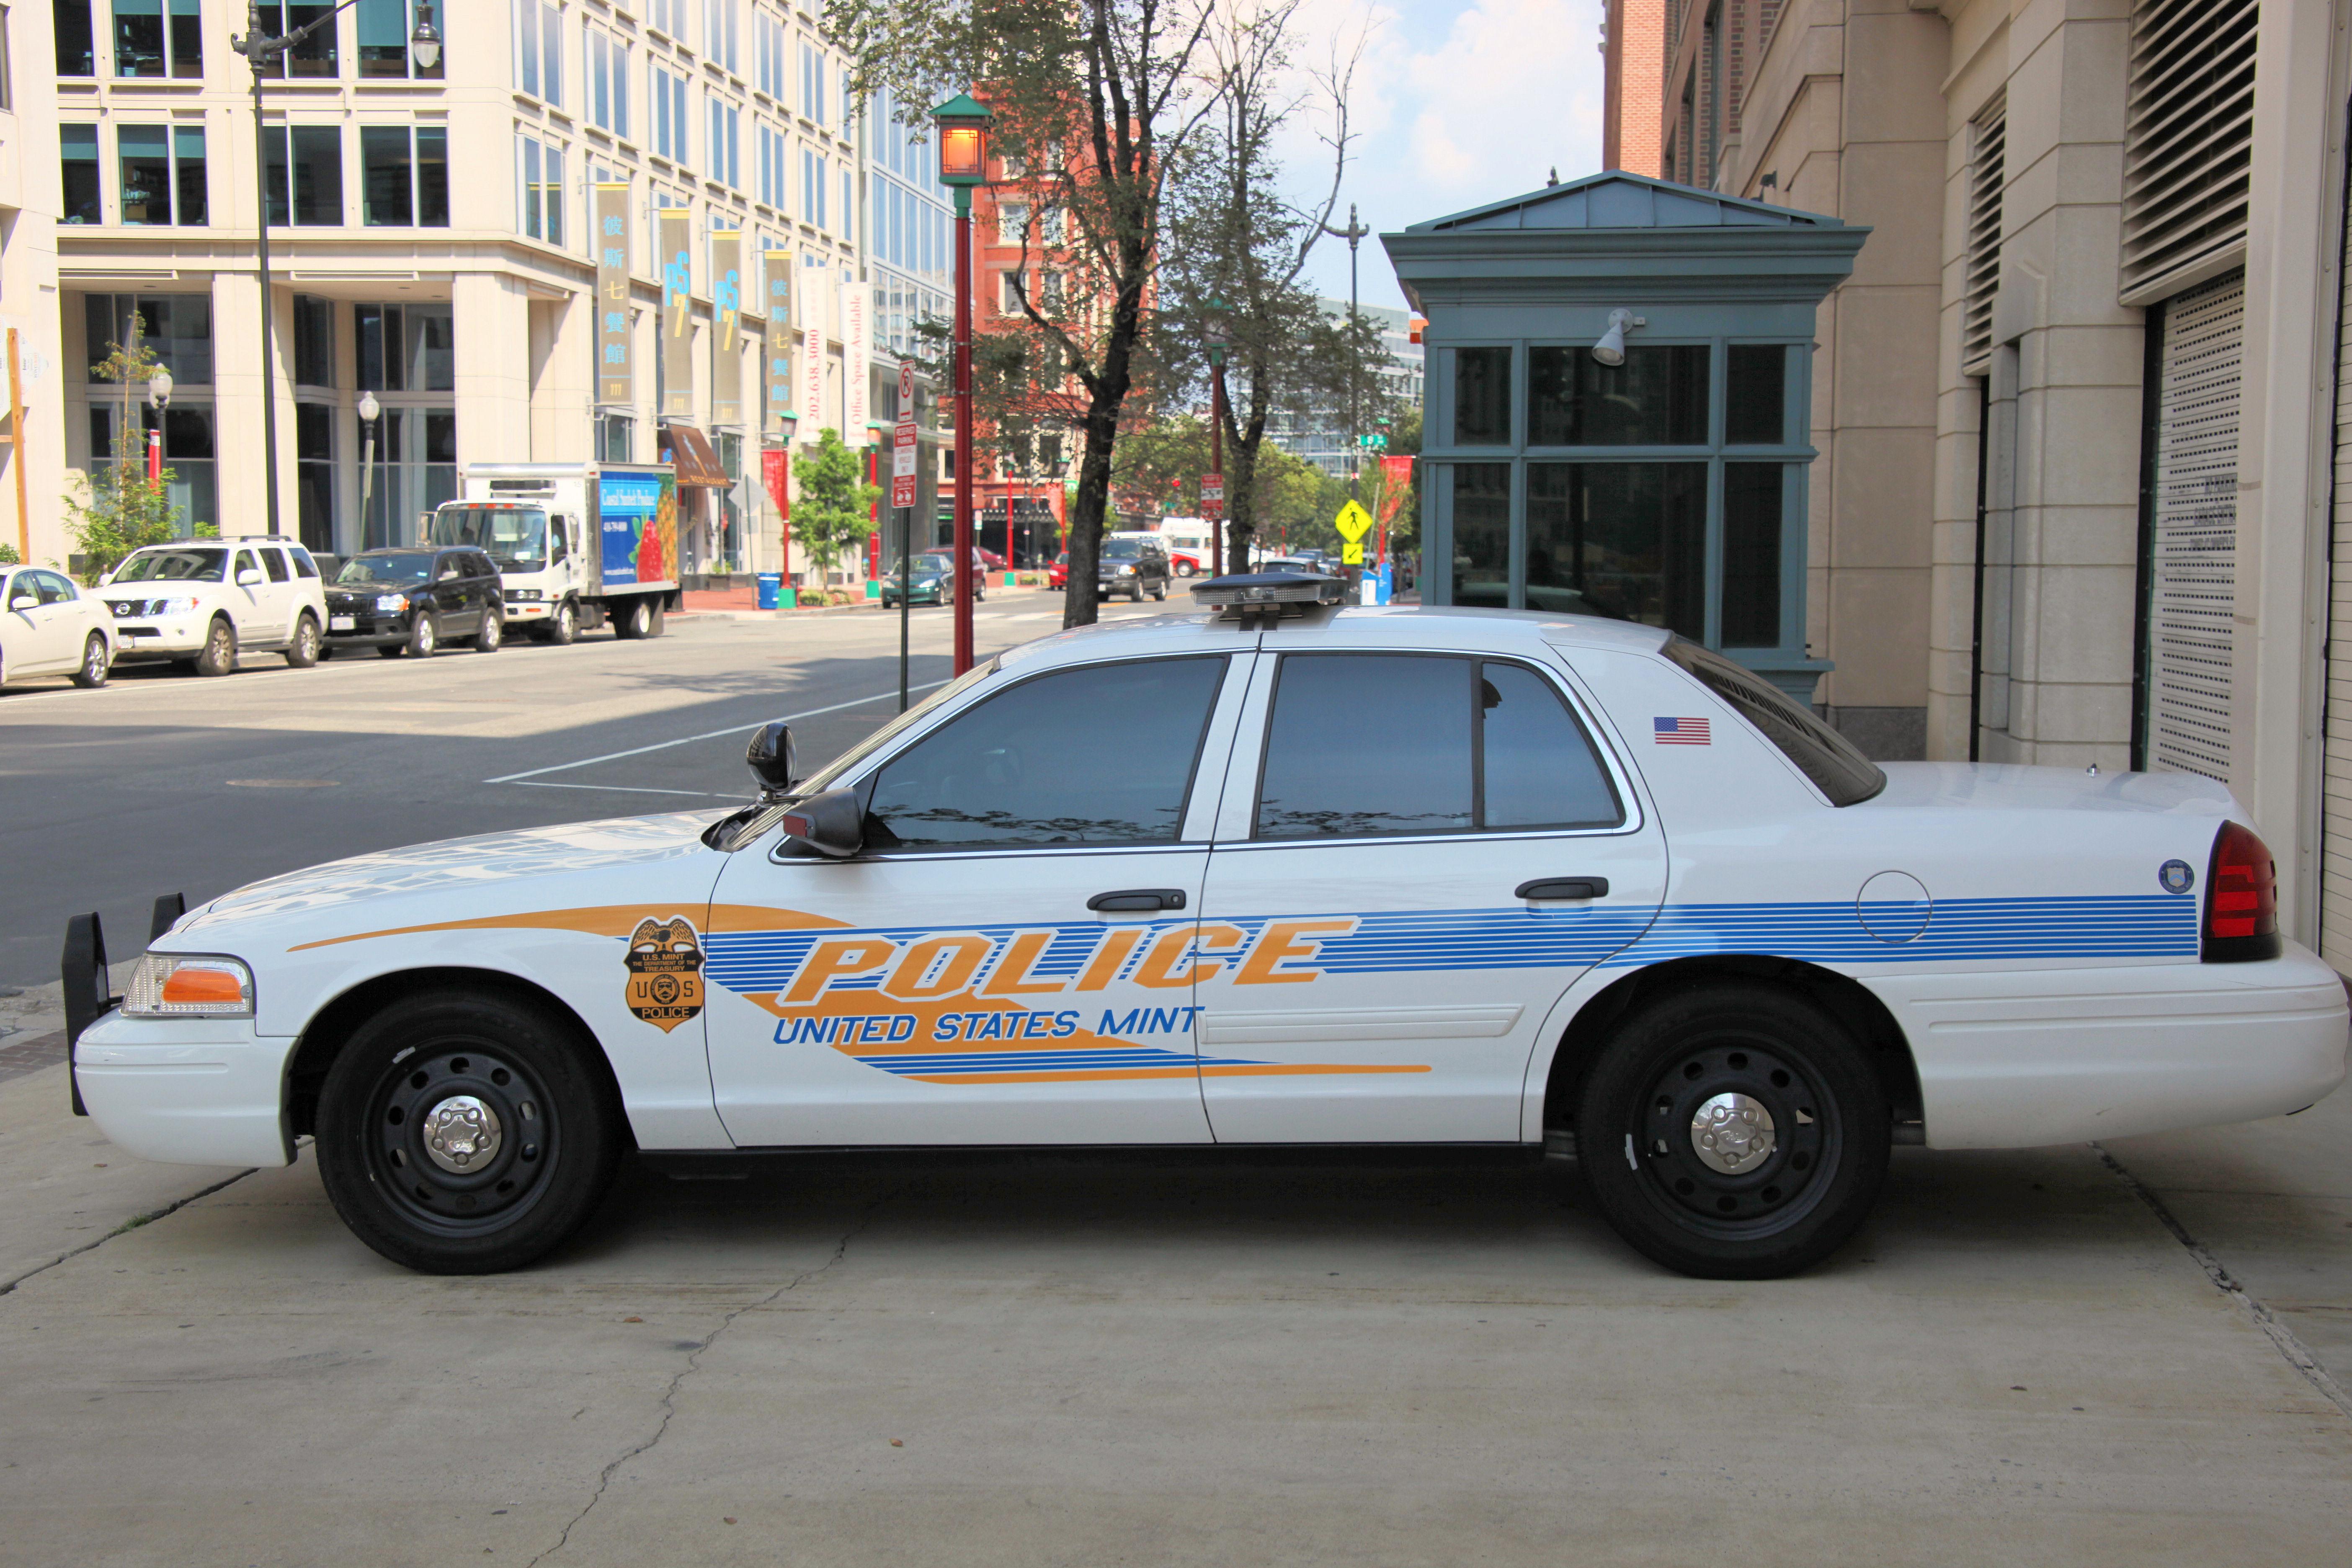 Us Police Car For Sale Uk